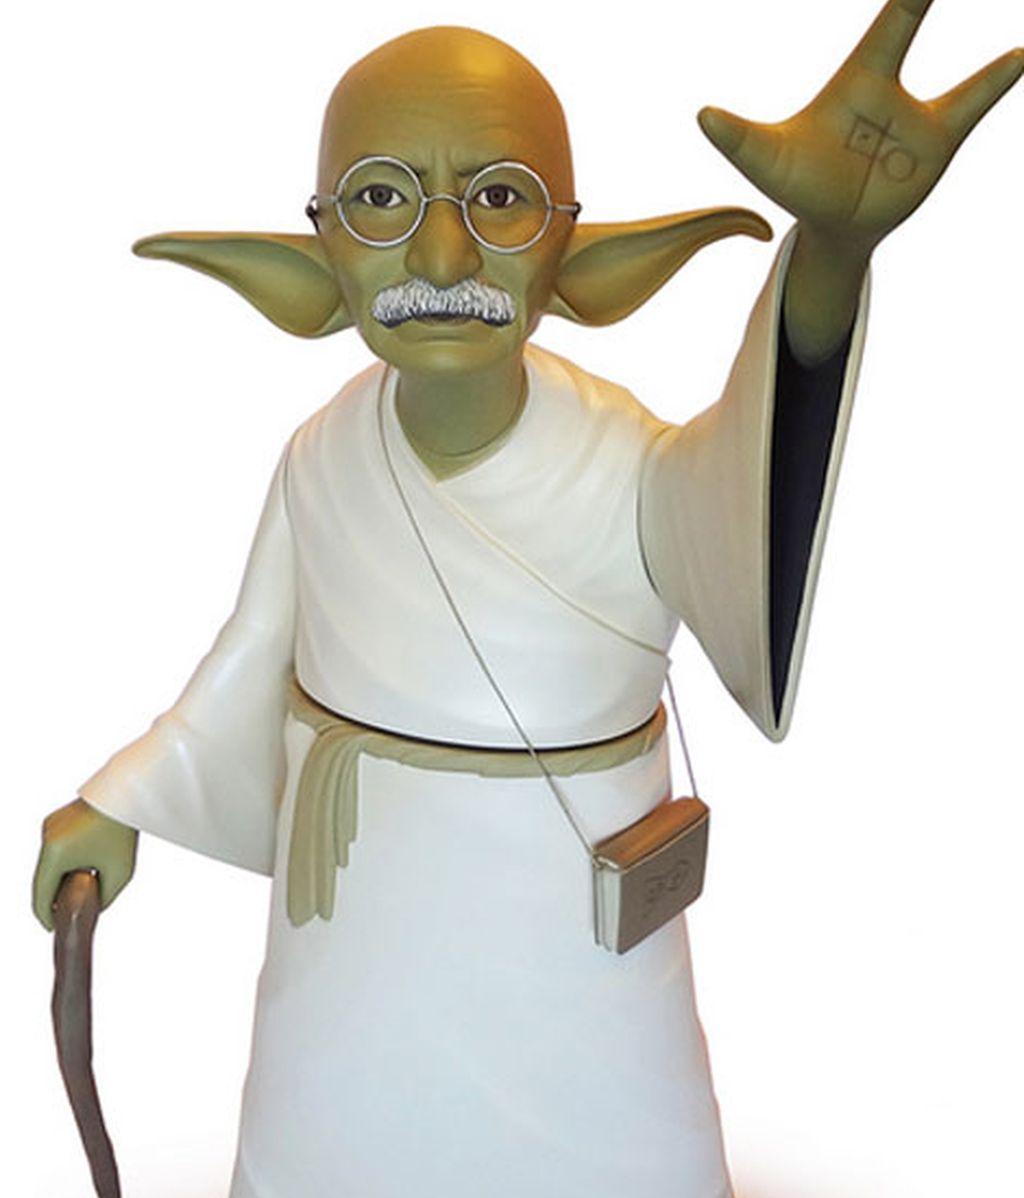 Star wars redefine su imagen con figuras como Ghandi, Obama o Angelina Jolie